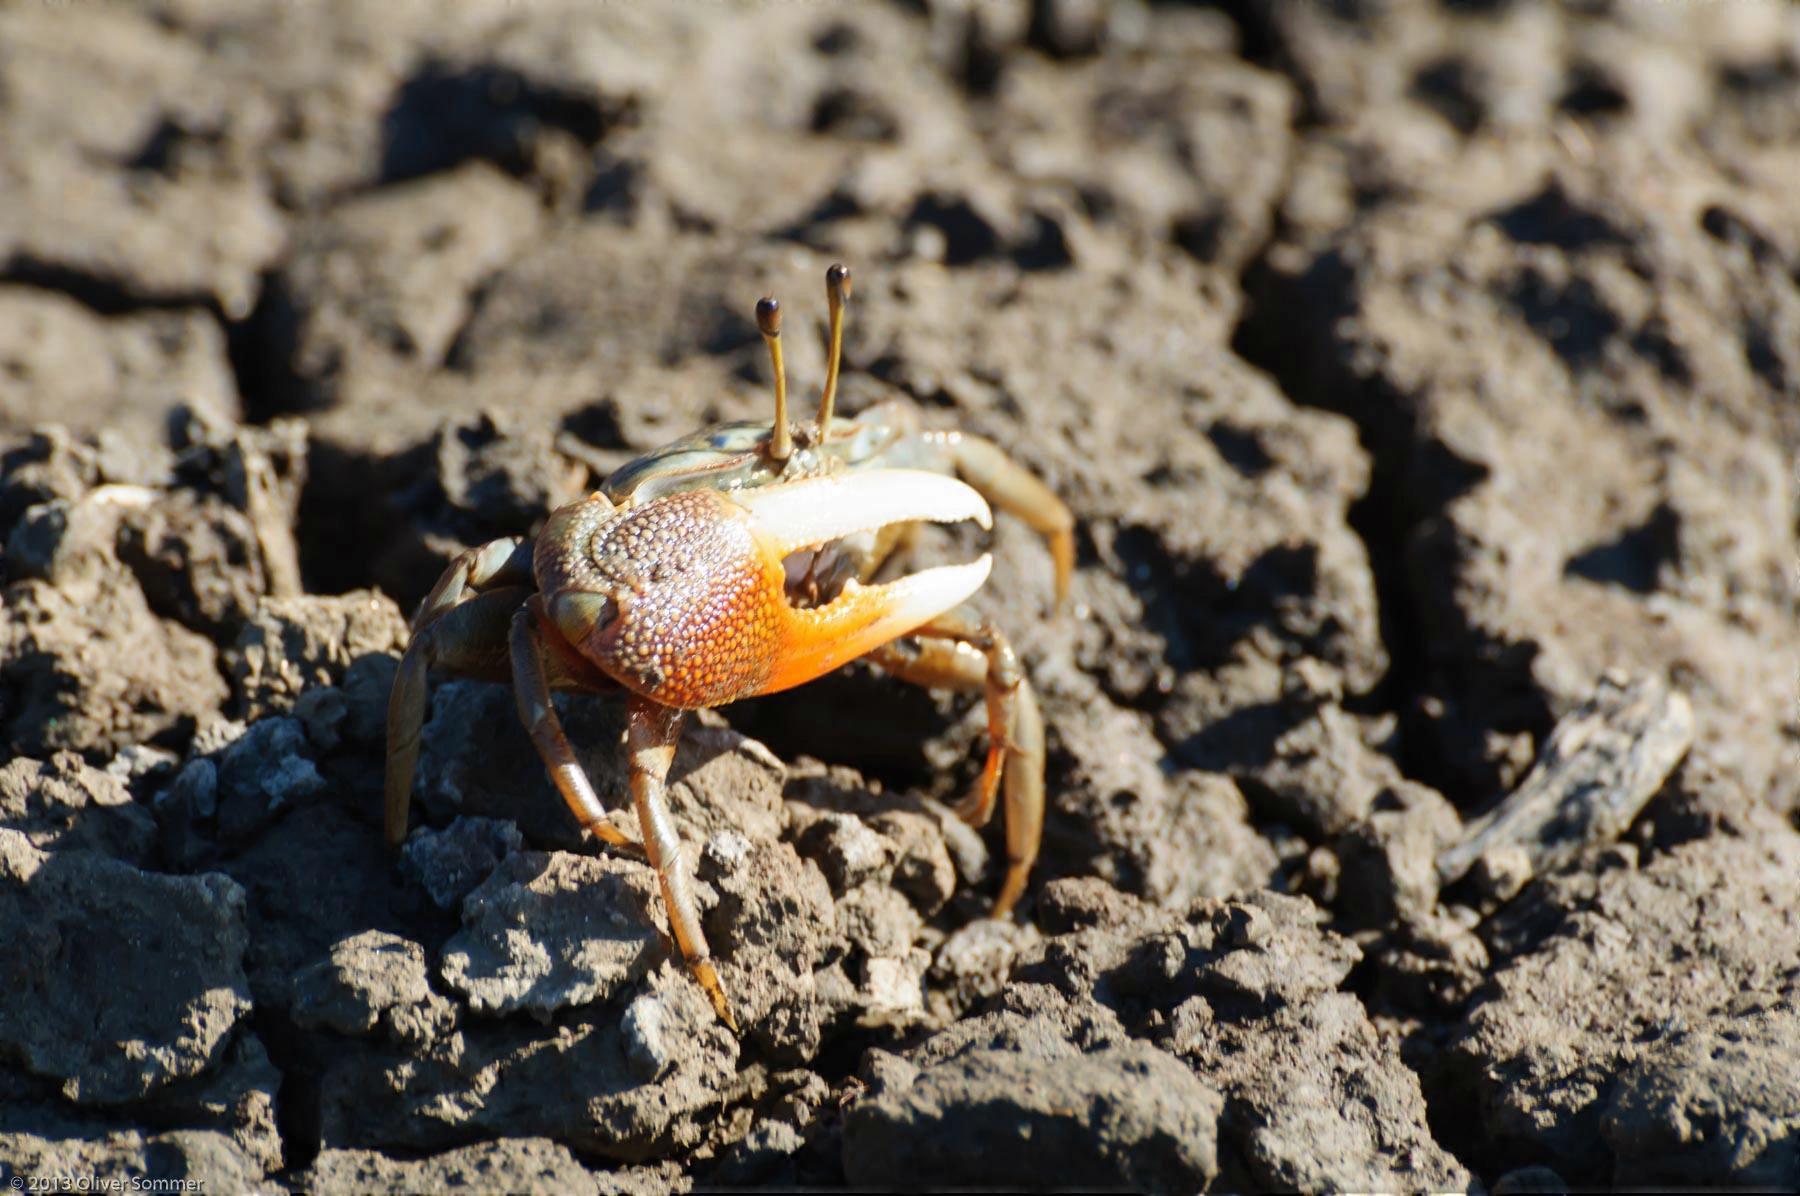 Urville Fiddler Crab Madagascar Mangrove Uca urvillei